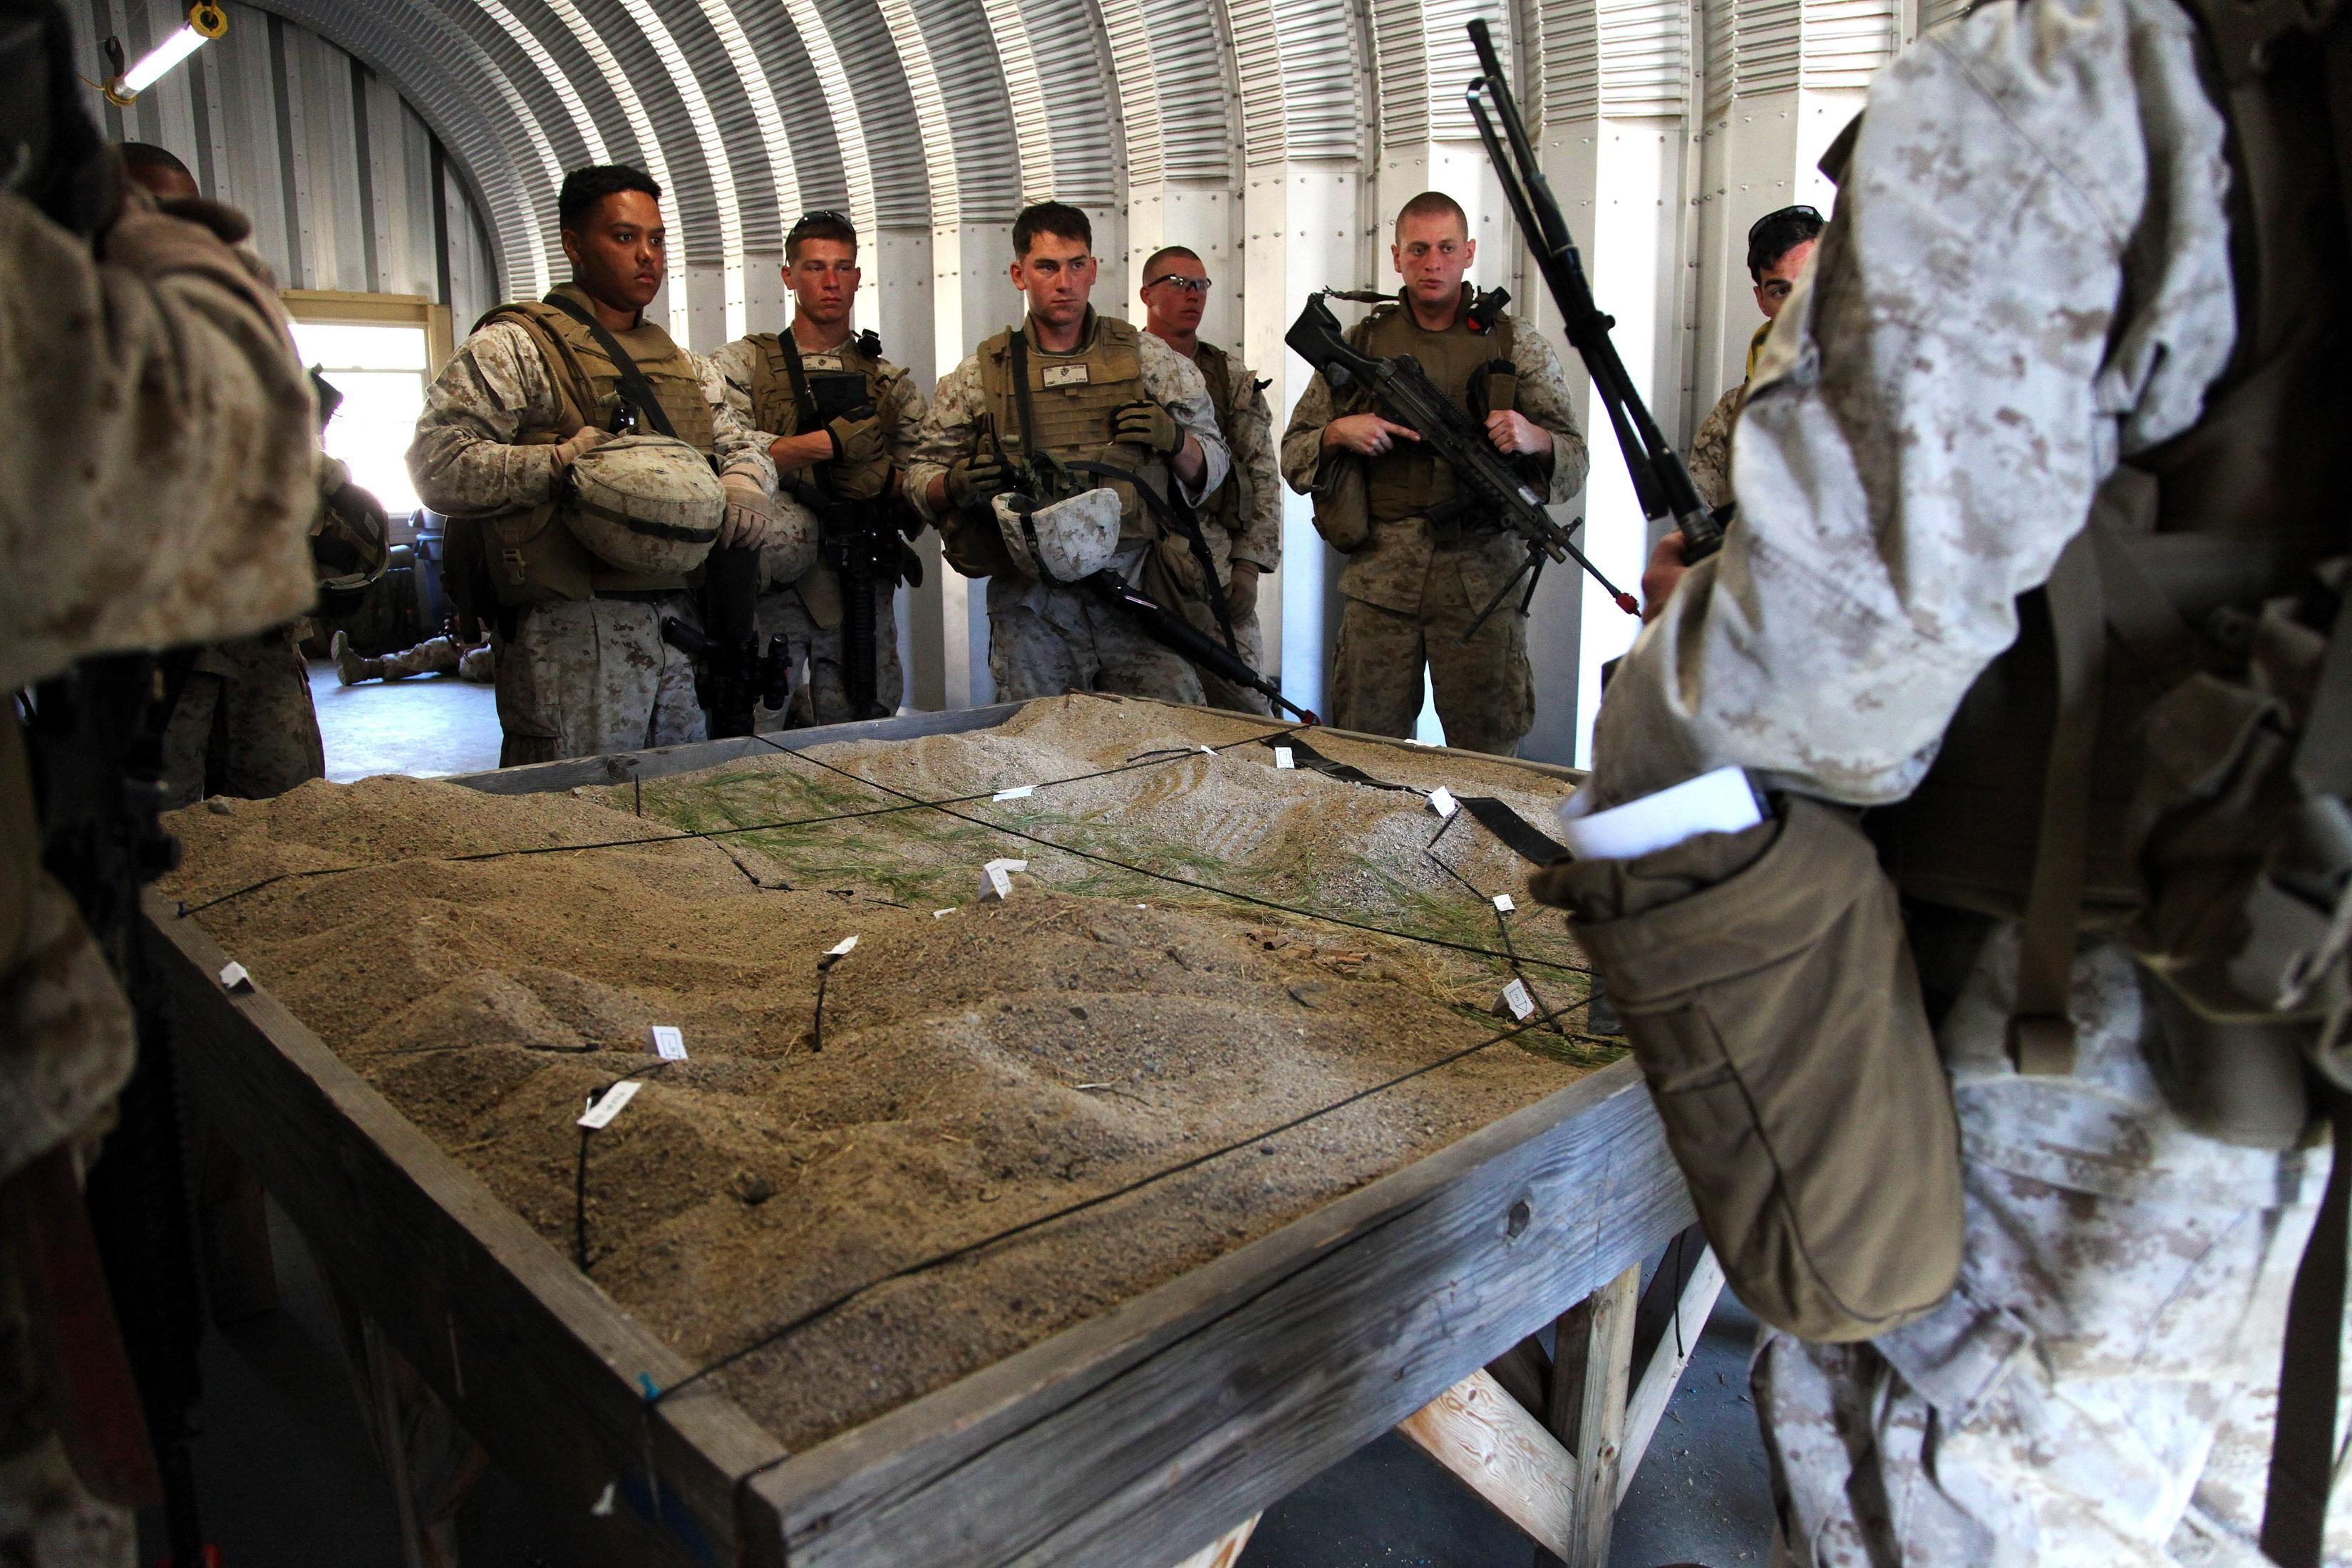 st marine logistics group > units > clr > maintenance bn marines 1st maintenance battalion 1st marine logistics group study a terrain model prior